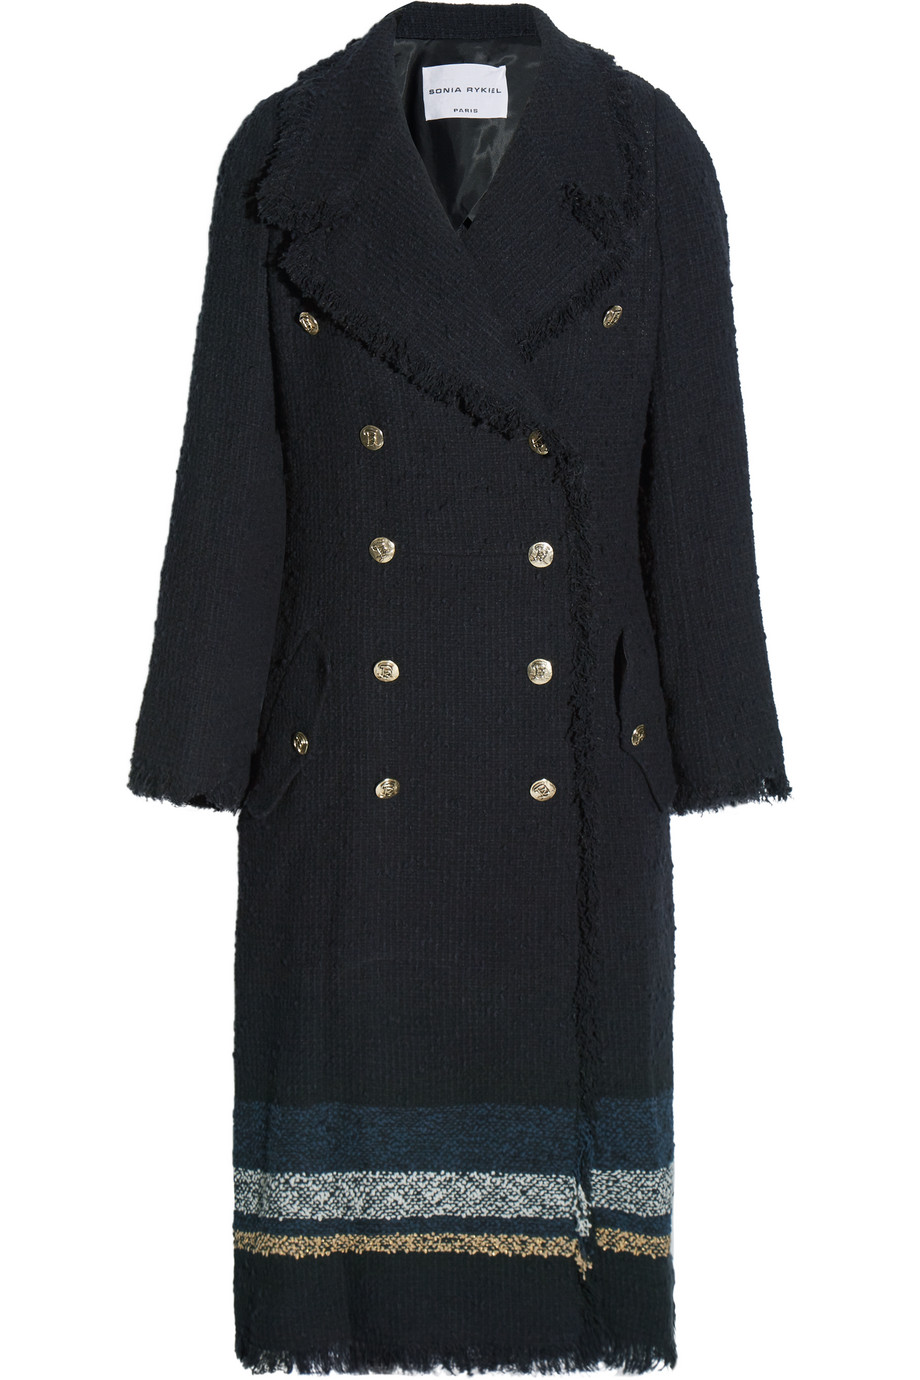 Sonia Rykiel Striped Bouclé-Tweed Coat, Size: 40